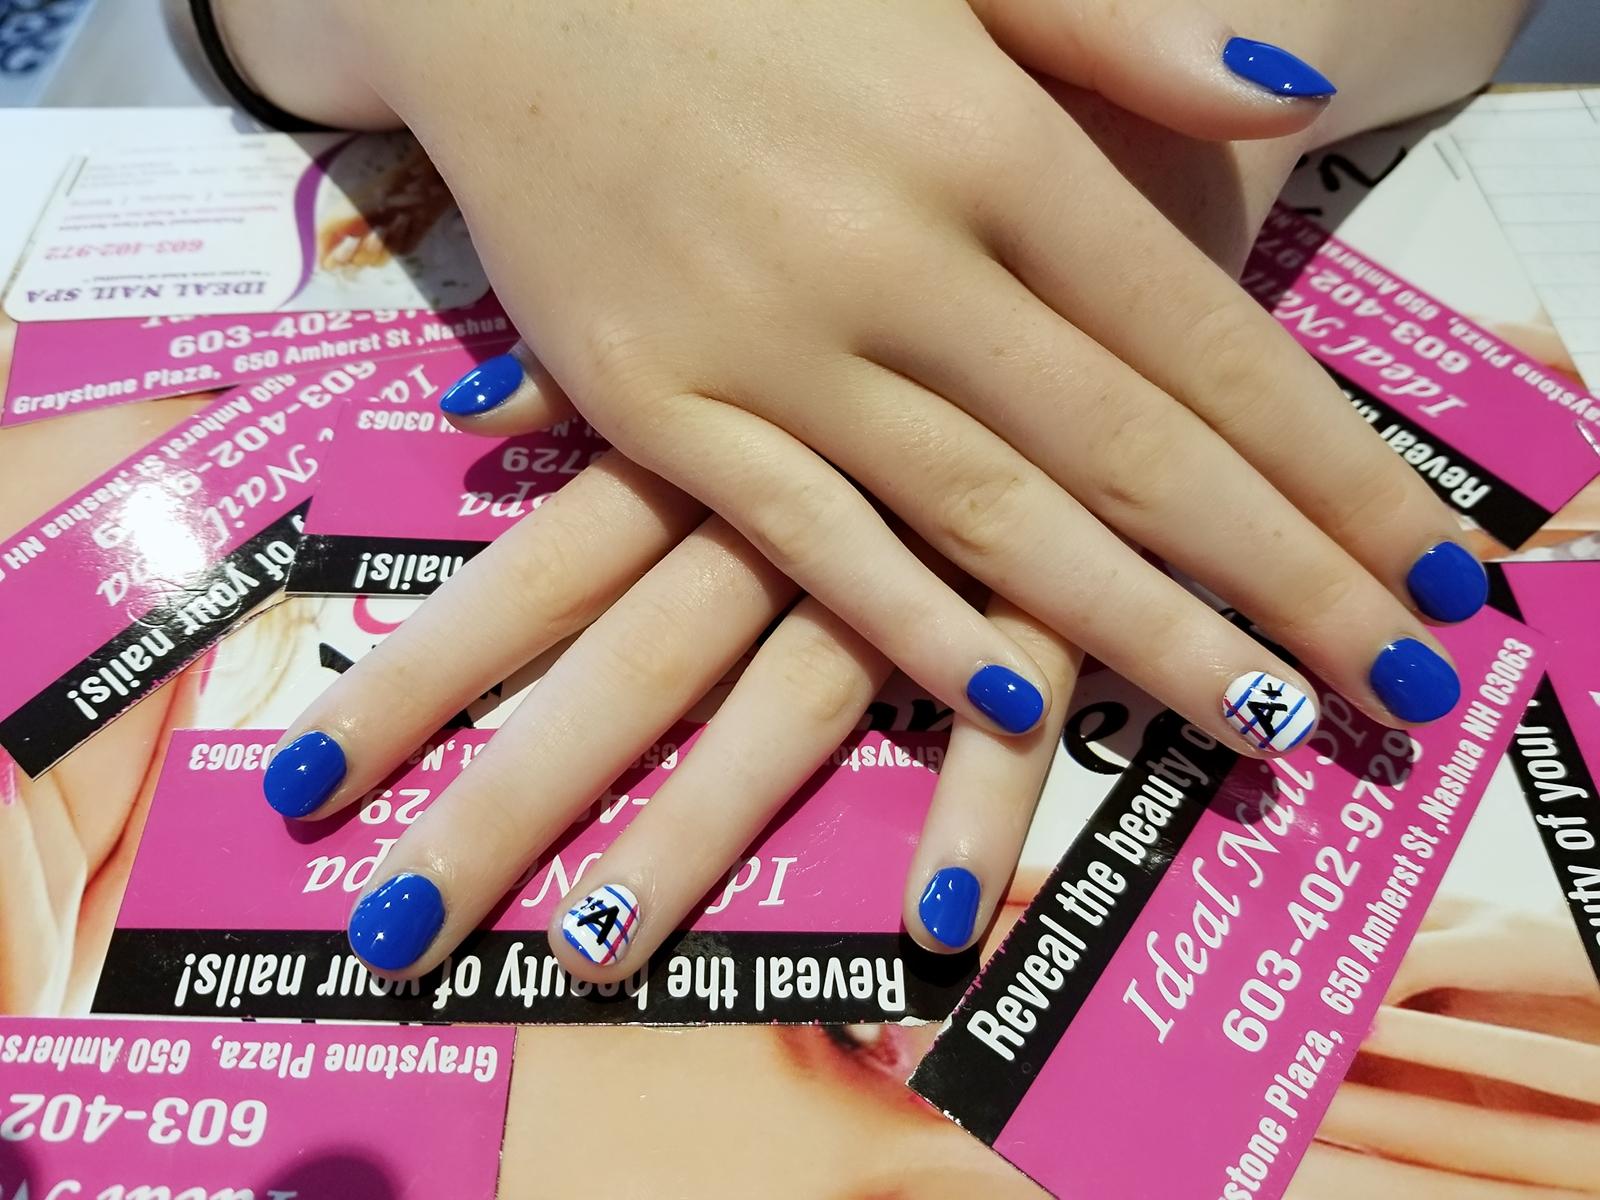 BeautyPlus_20170911111323_save